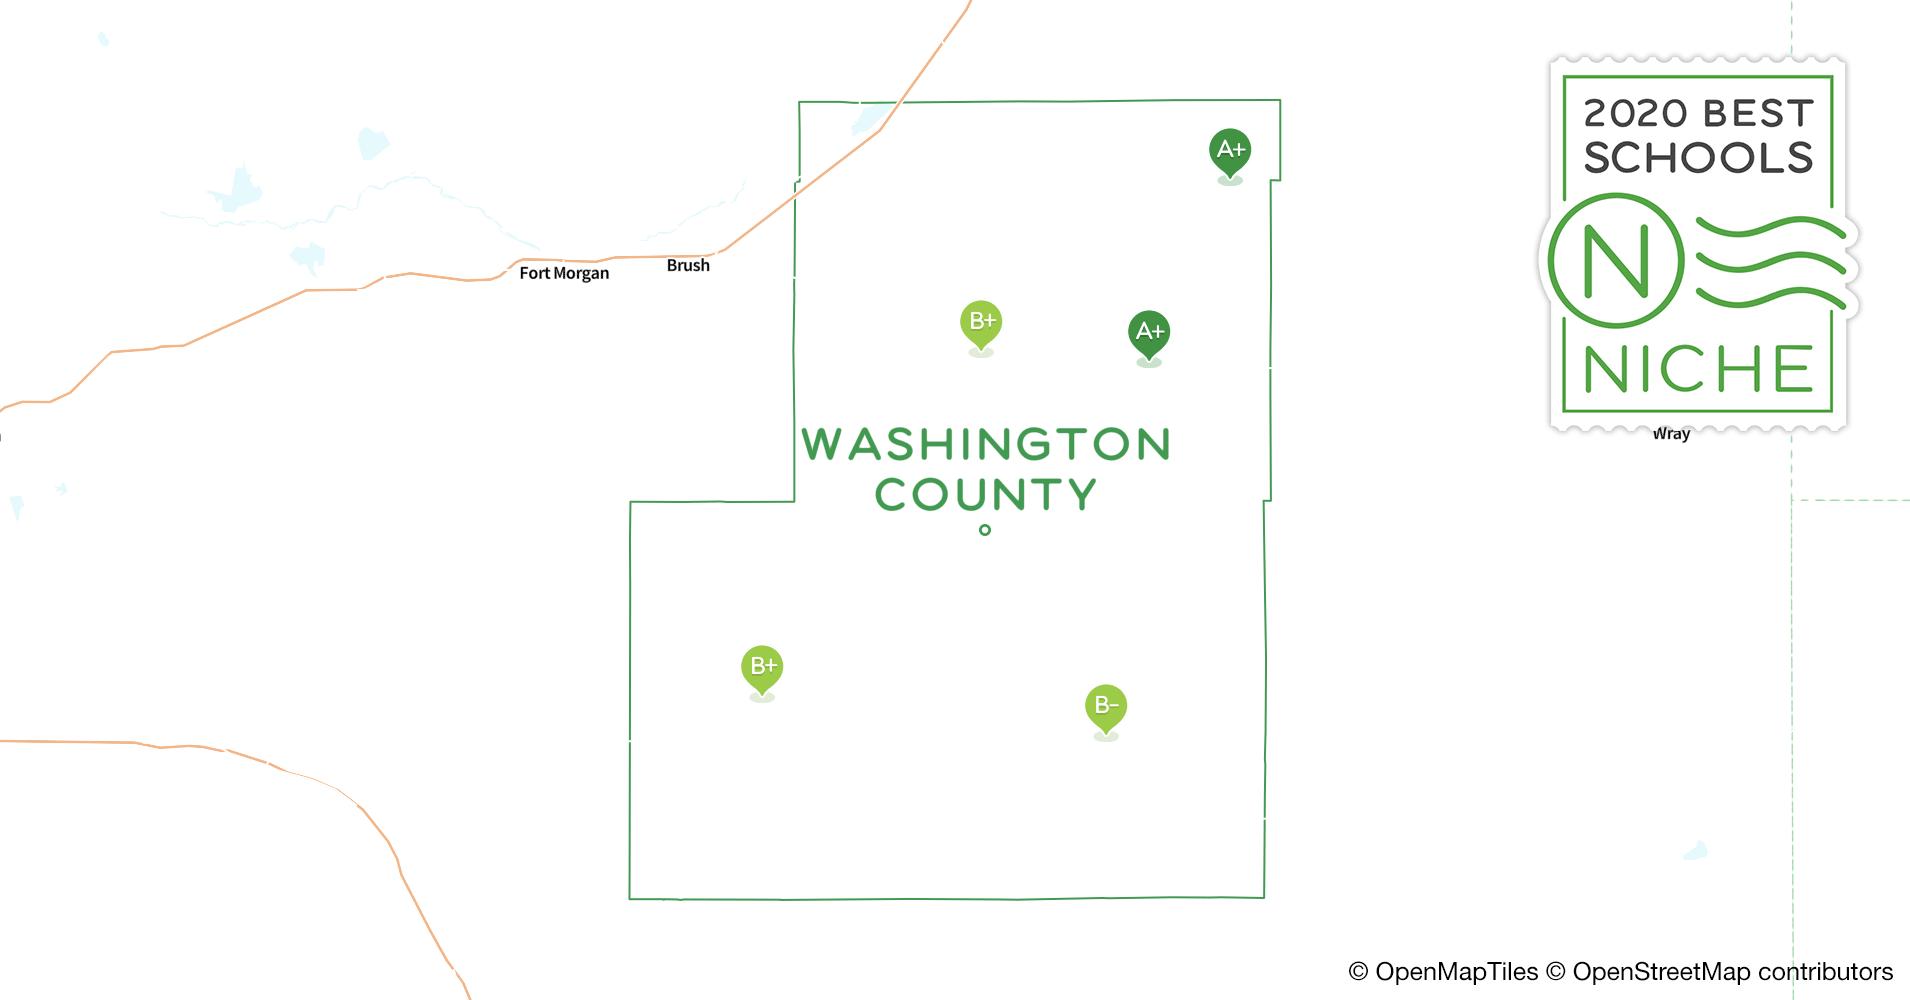 School Districts in Washington County, CO - Niche